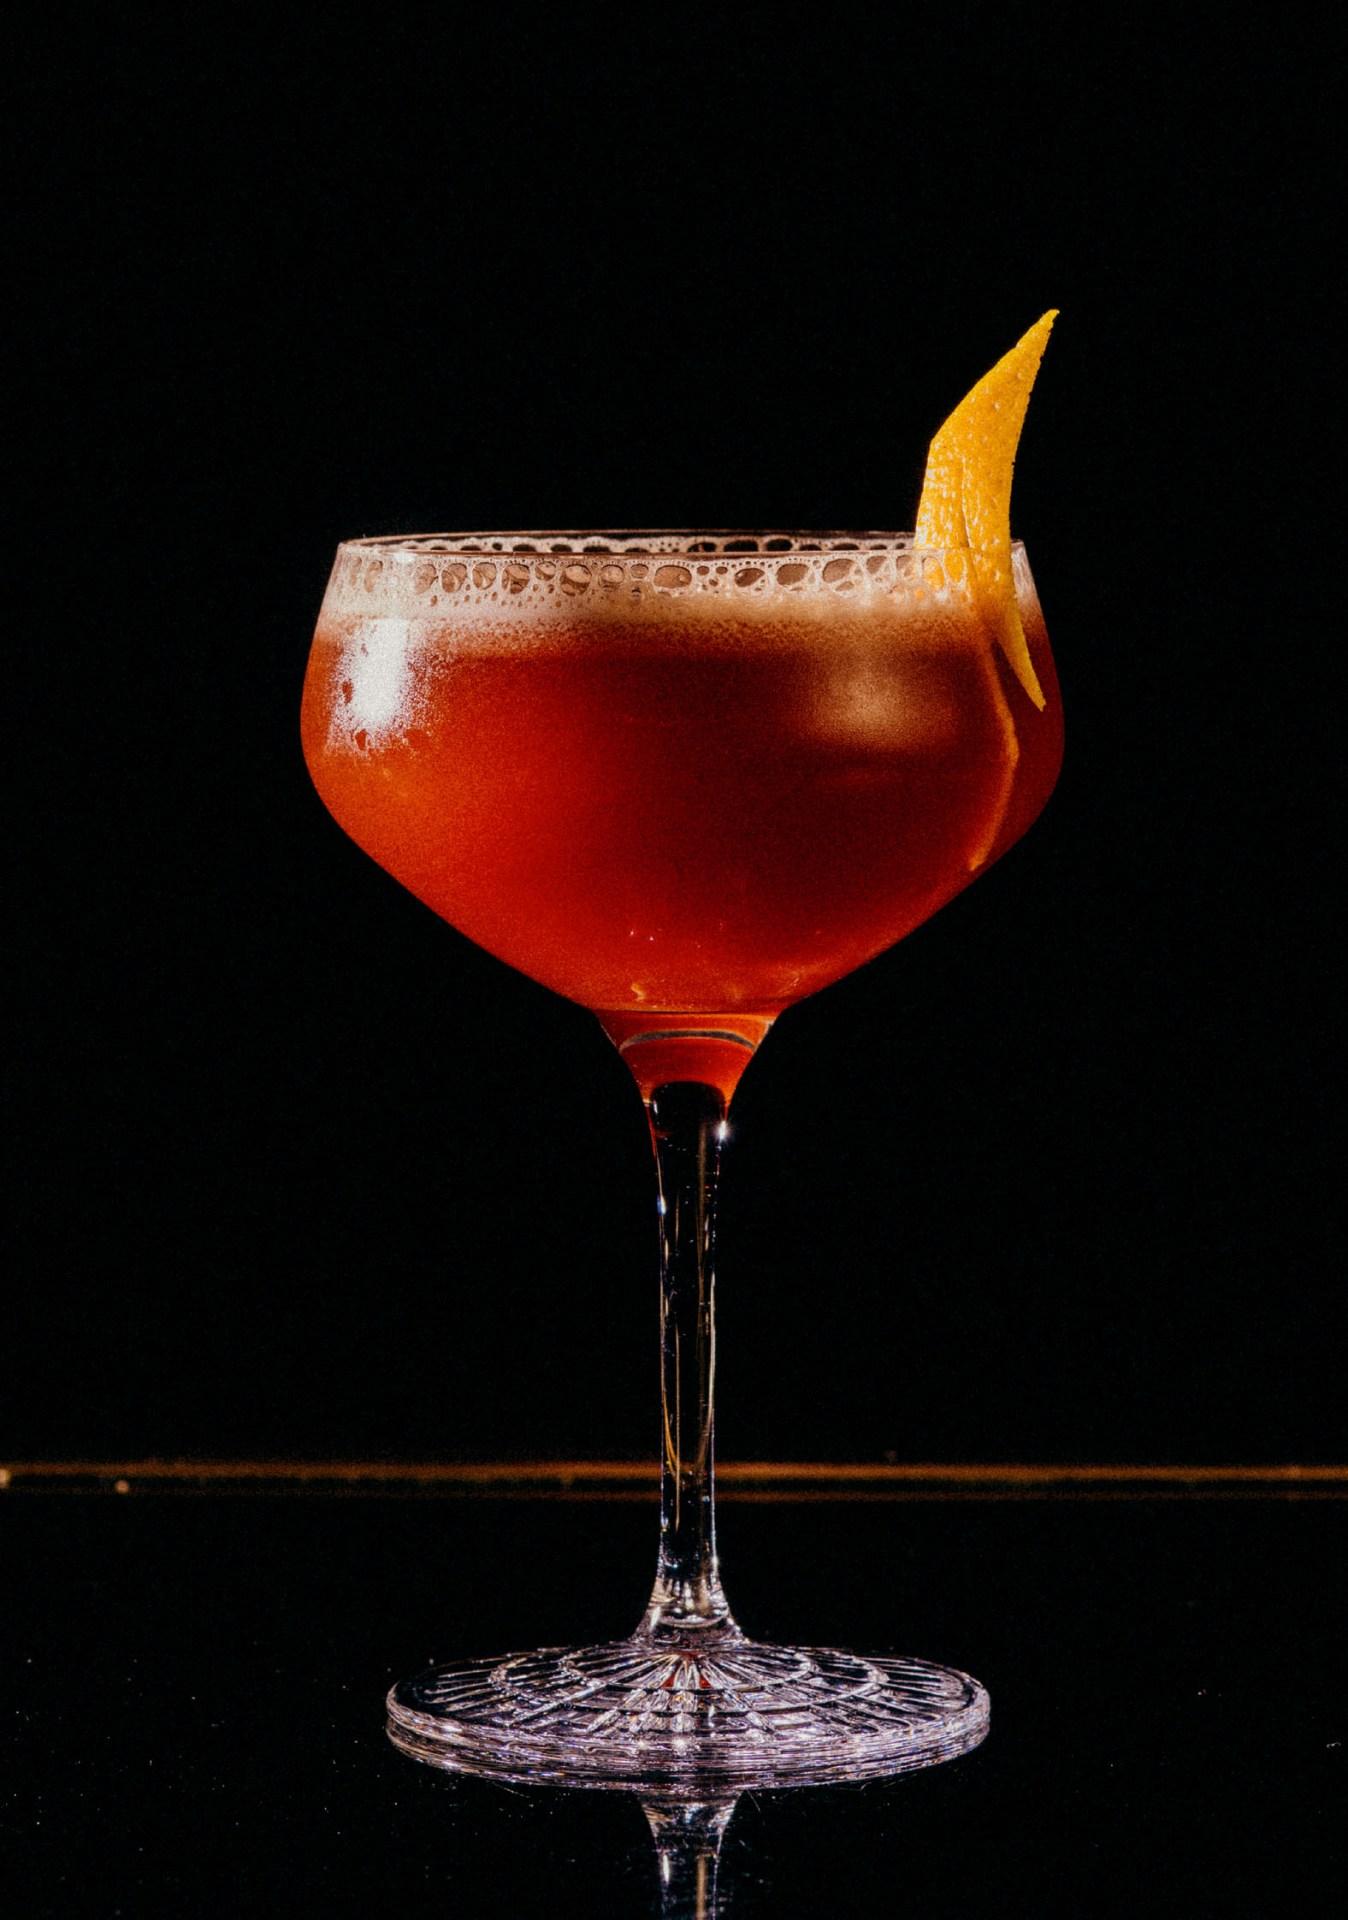 Recipe: 2cl Talisker 10 Years 2cl Antica Formula 2cl Heering Cherry 2cl Orange Juice